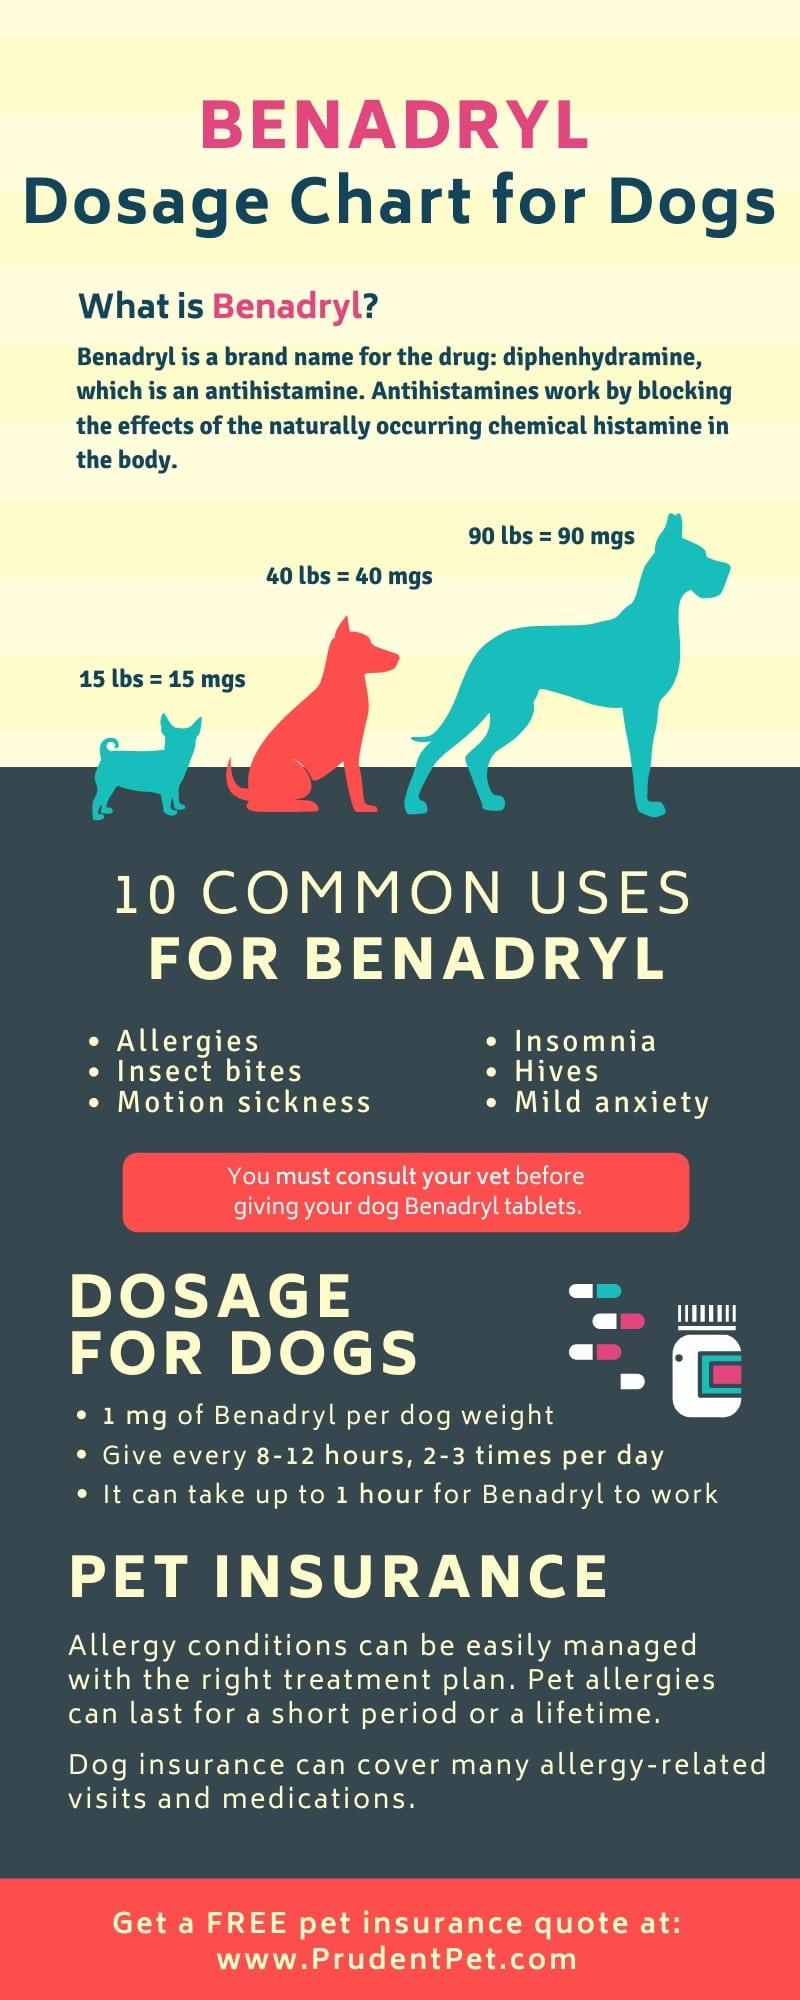 Benadryl infographic from Prudent Pet